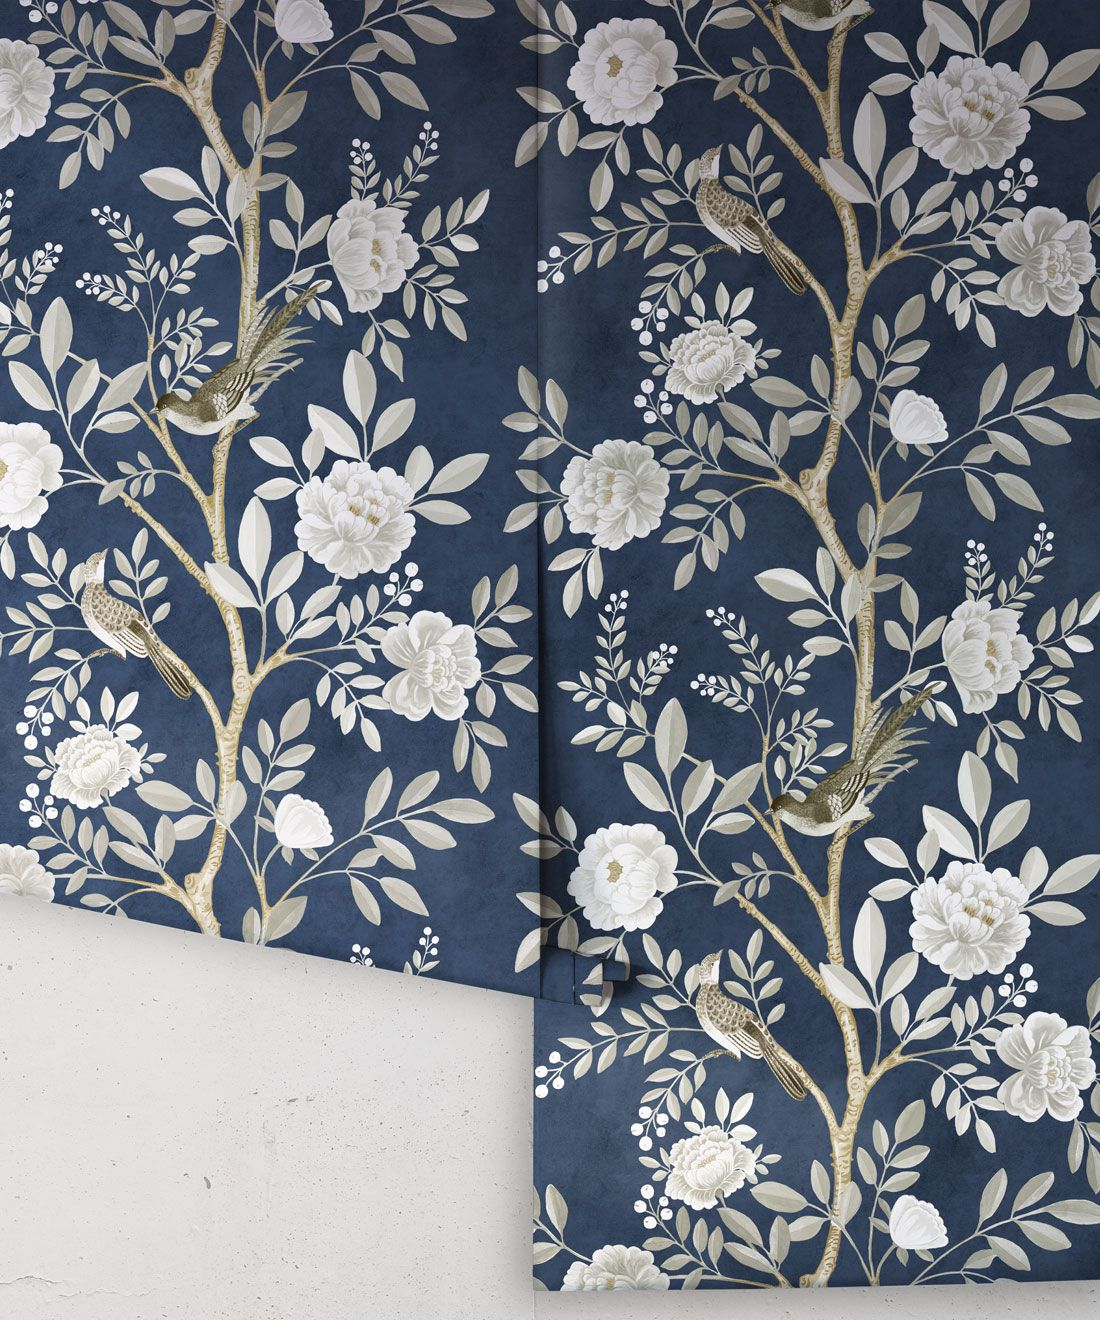 Chinoiserie Wallpaper •Floral Wallpaper •Bird Wallpaper • Magnolia • Royal Blue • Rolls